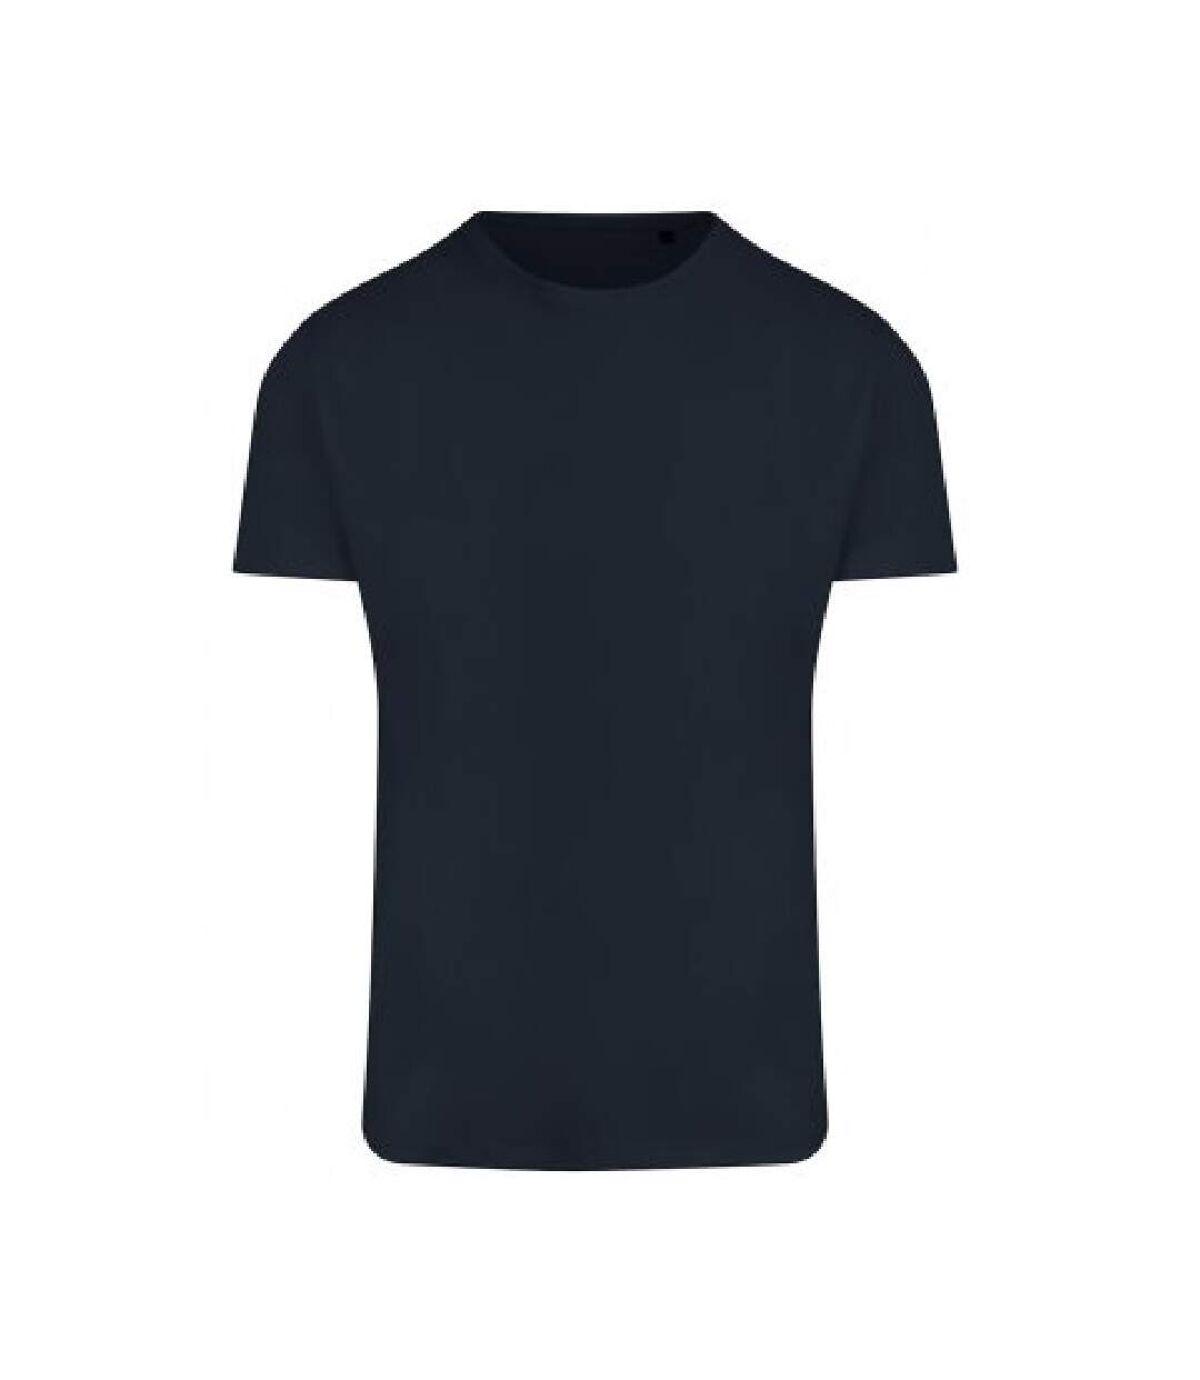 Ecologie Mens Ambaro Recycled Sports T-Shirt (French Navy) - UTPC4088